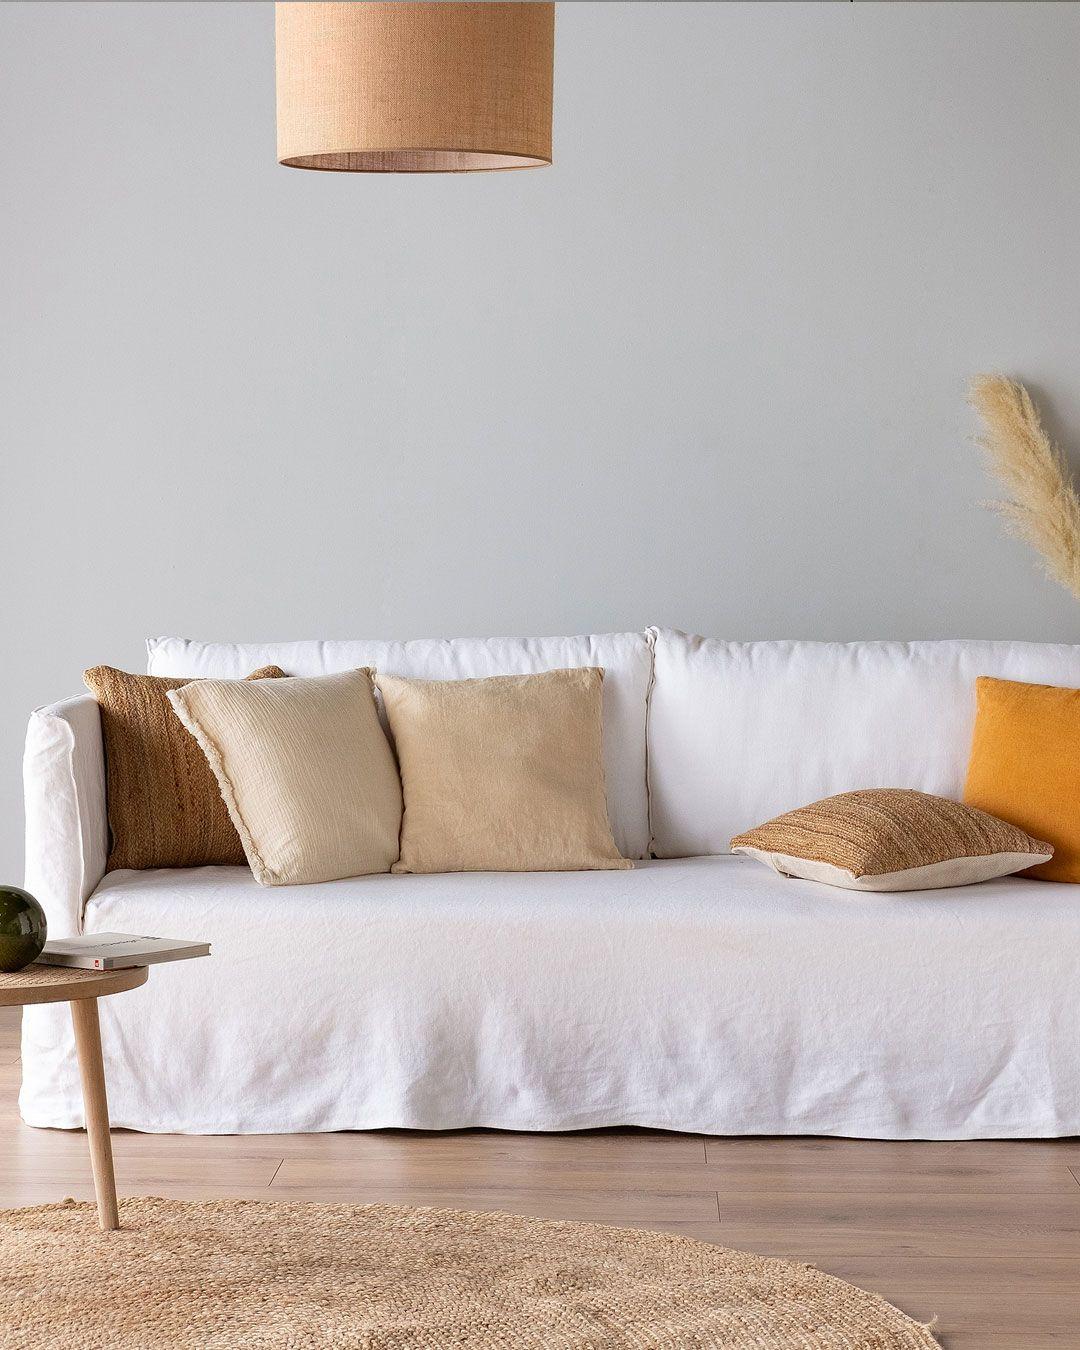 Ressort Zig Zag Canapé Avis canapé 3 places fixe en lin beige roucas - alinéa en 2020